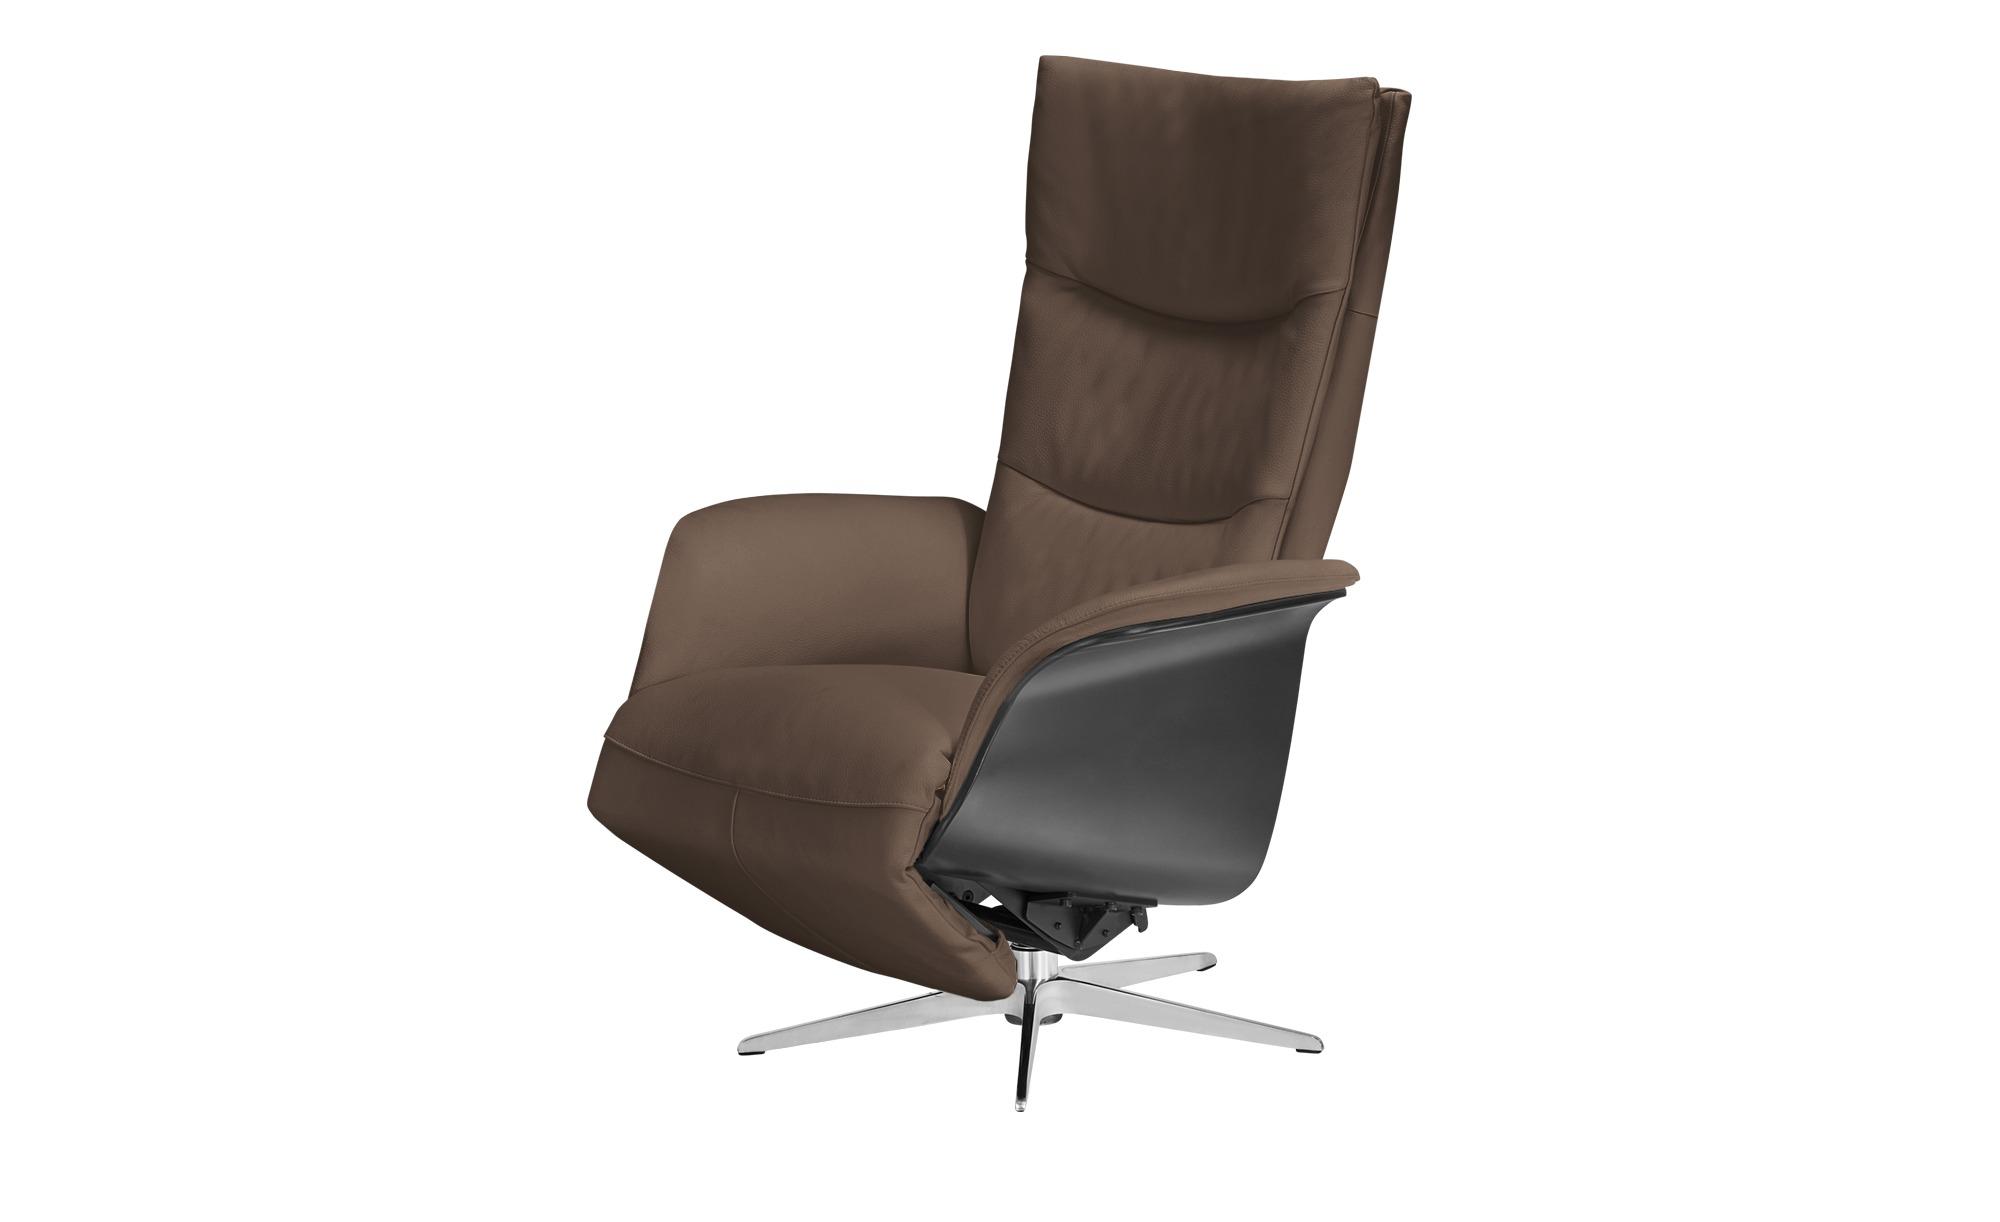 Relaxsessel braun - Leder Mika ¦ braun ¦ Maße (cm): B: 77 H: 109 T: 82 Polstermöbel > Sessel > Fernsehsessel - Höffner